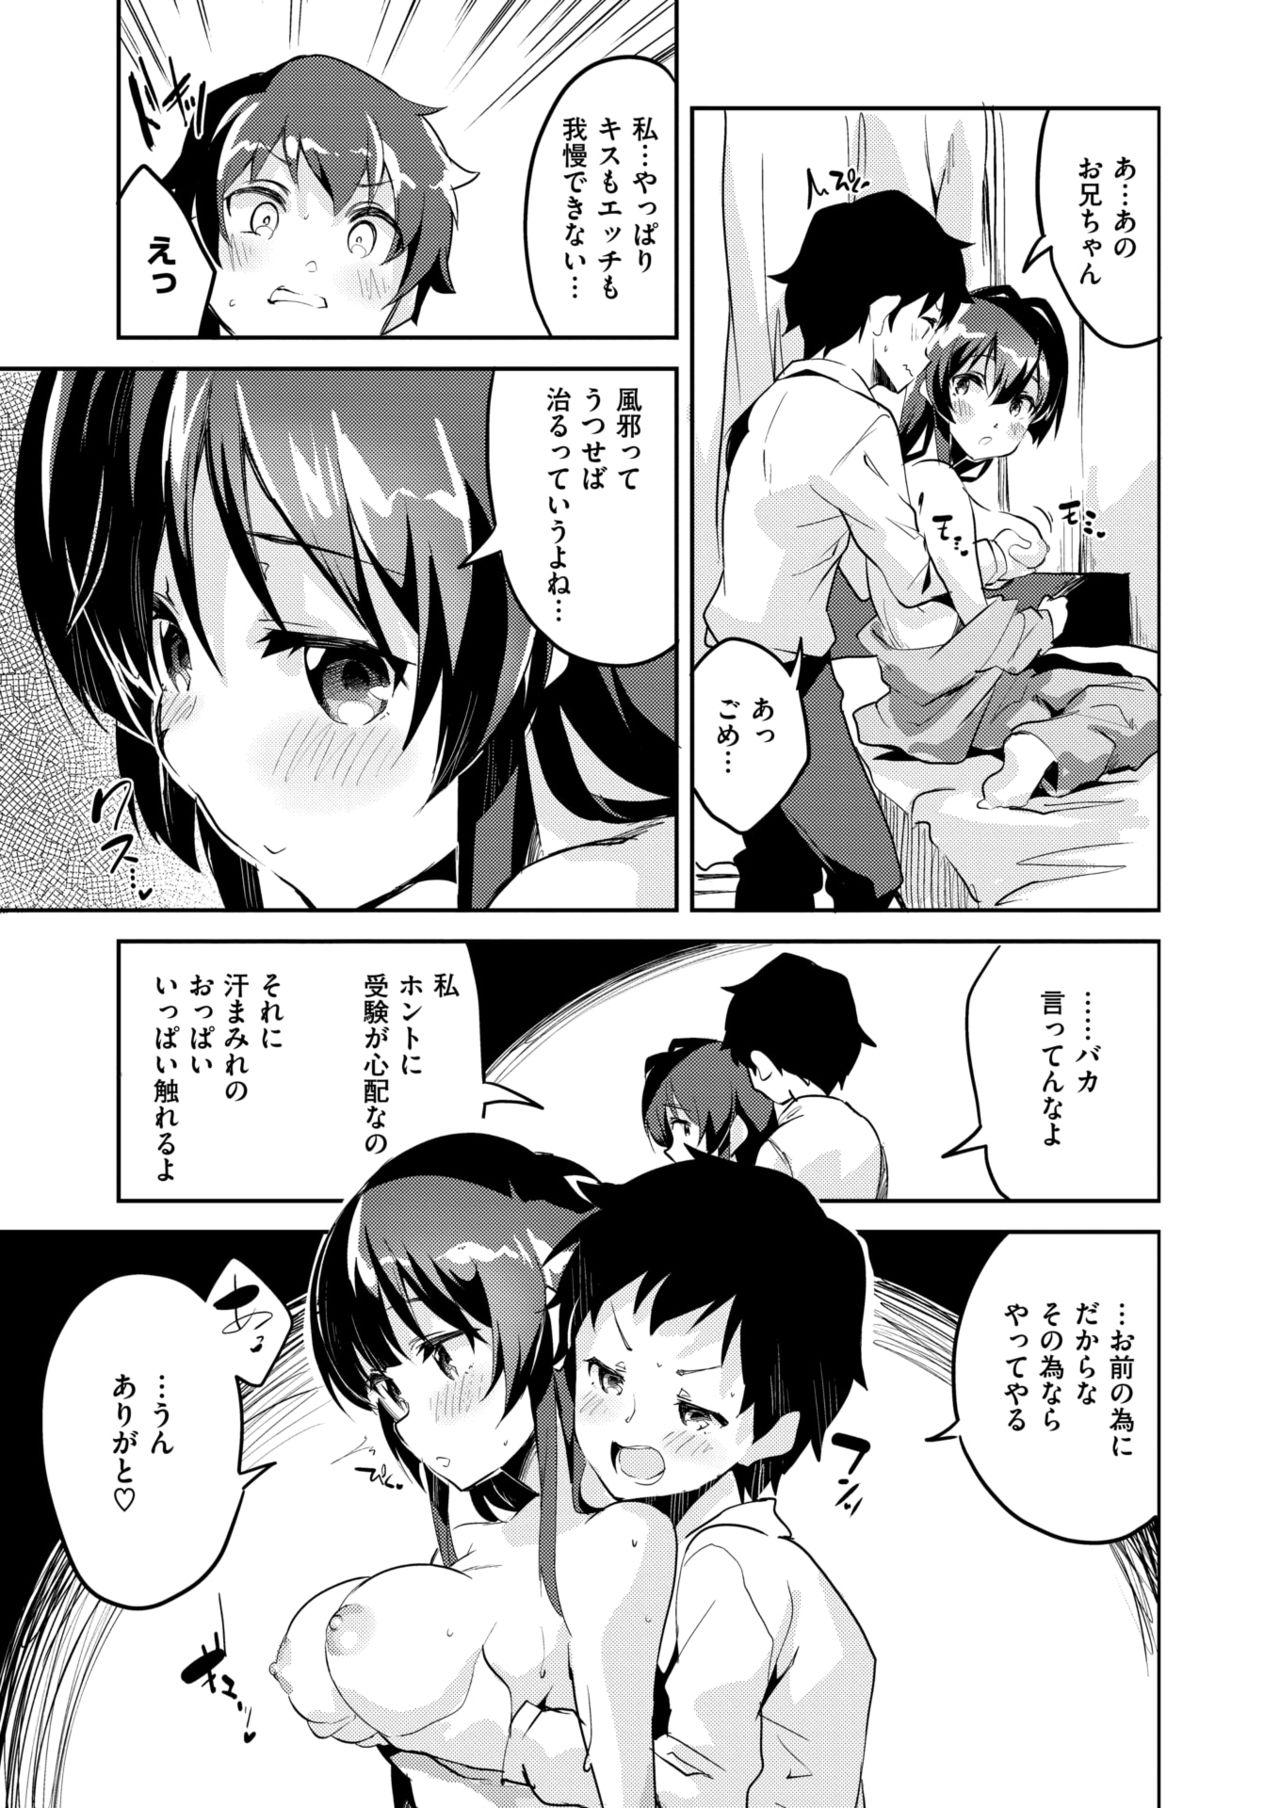 _ekakibito_imoutohataoretemokisuma_COMIC_X_EROS_zerosu_63_